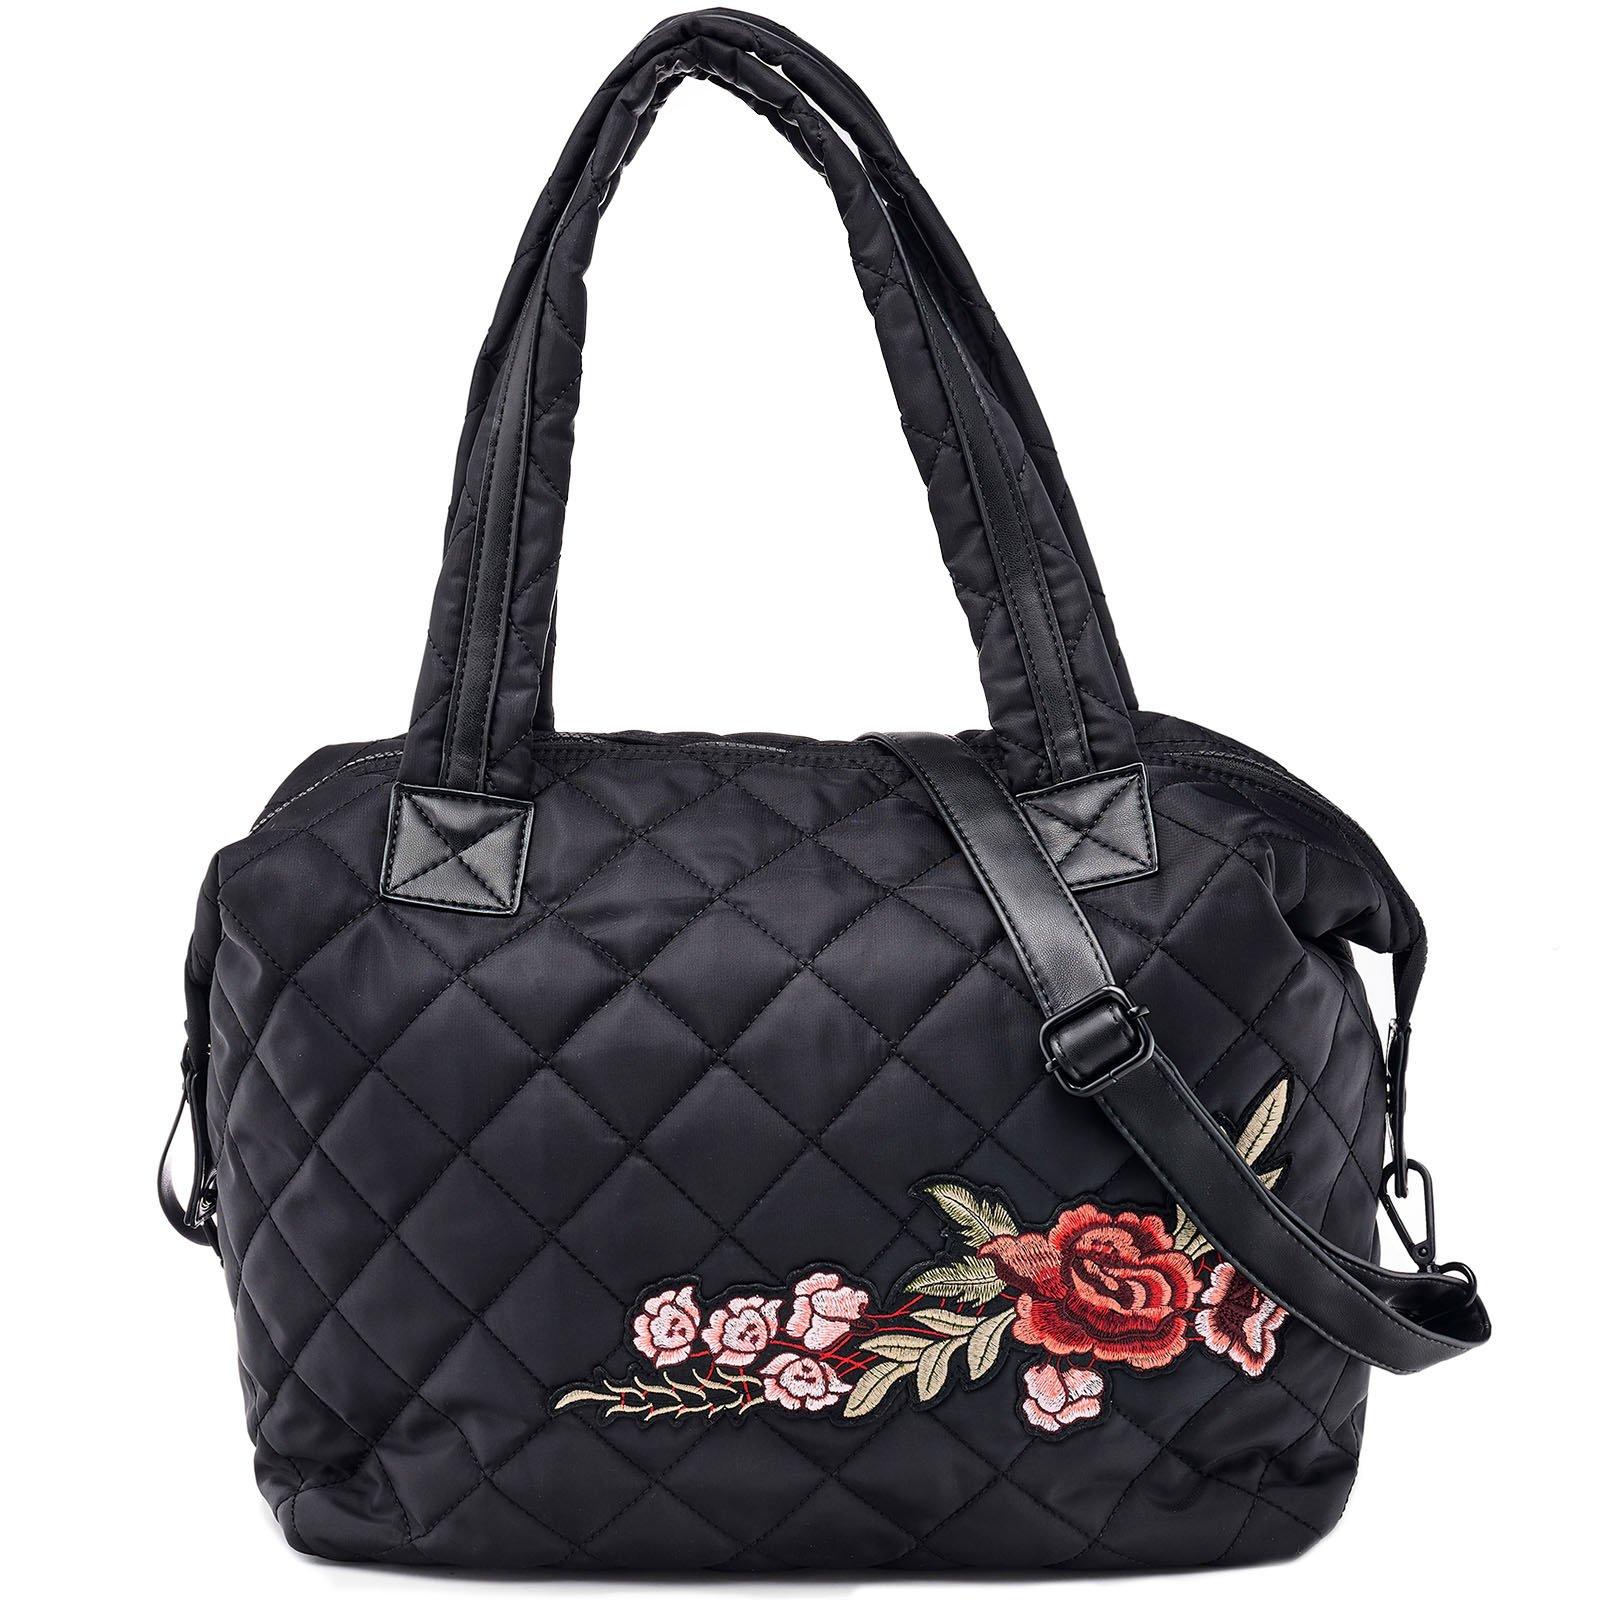 Dream Control Floral Emb Quilted Nylon Tote Shopping Shopper Shoulder Bag Black